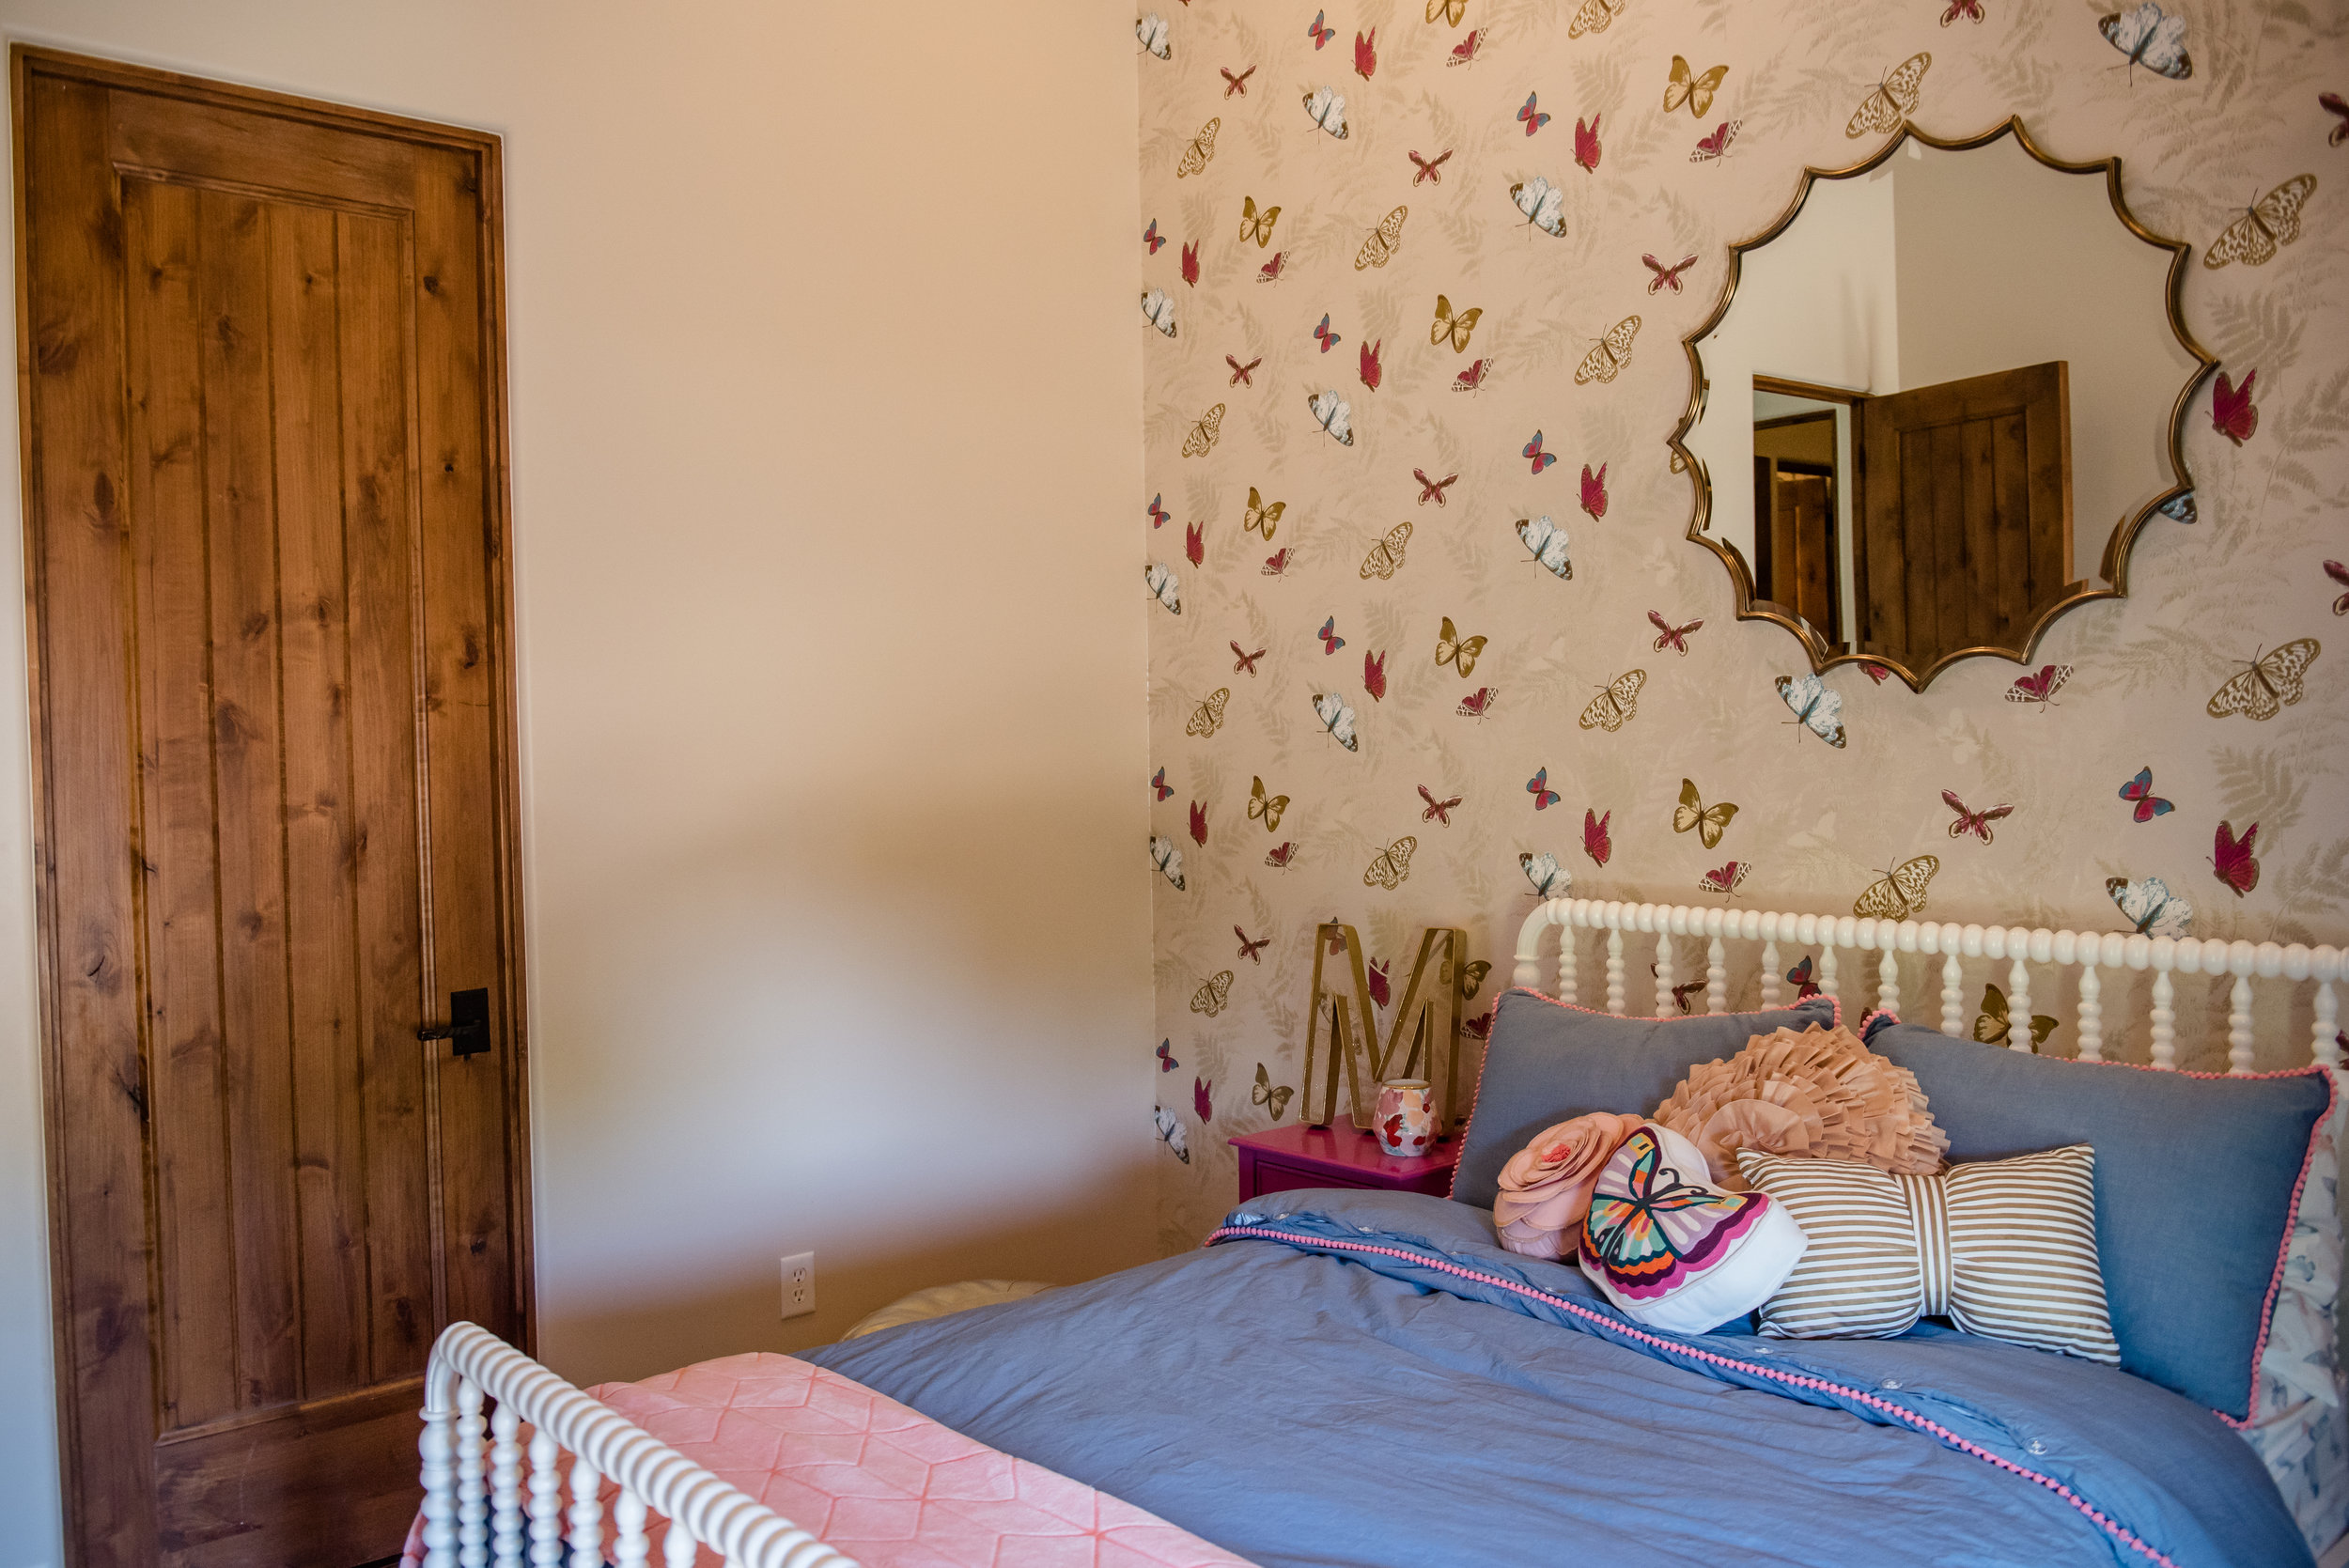 48+girlsroom+mirror+wallpaper+butterfly+bedding.jpg